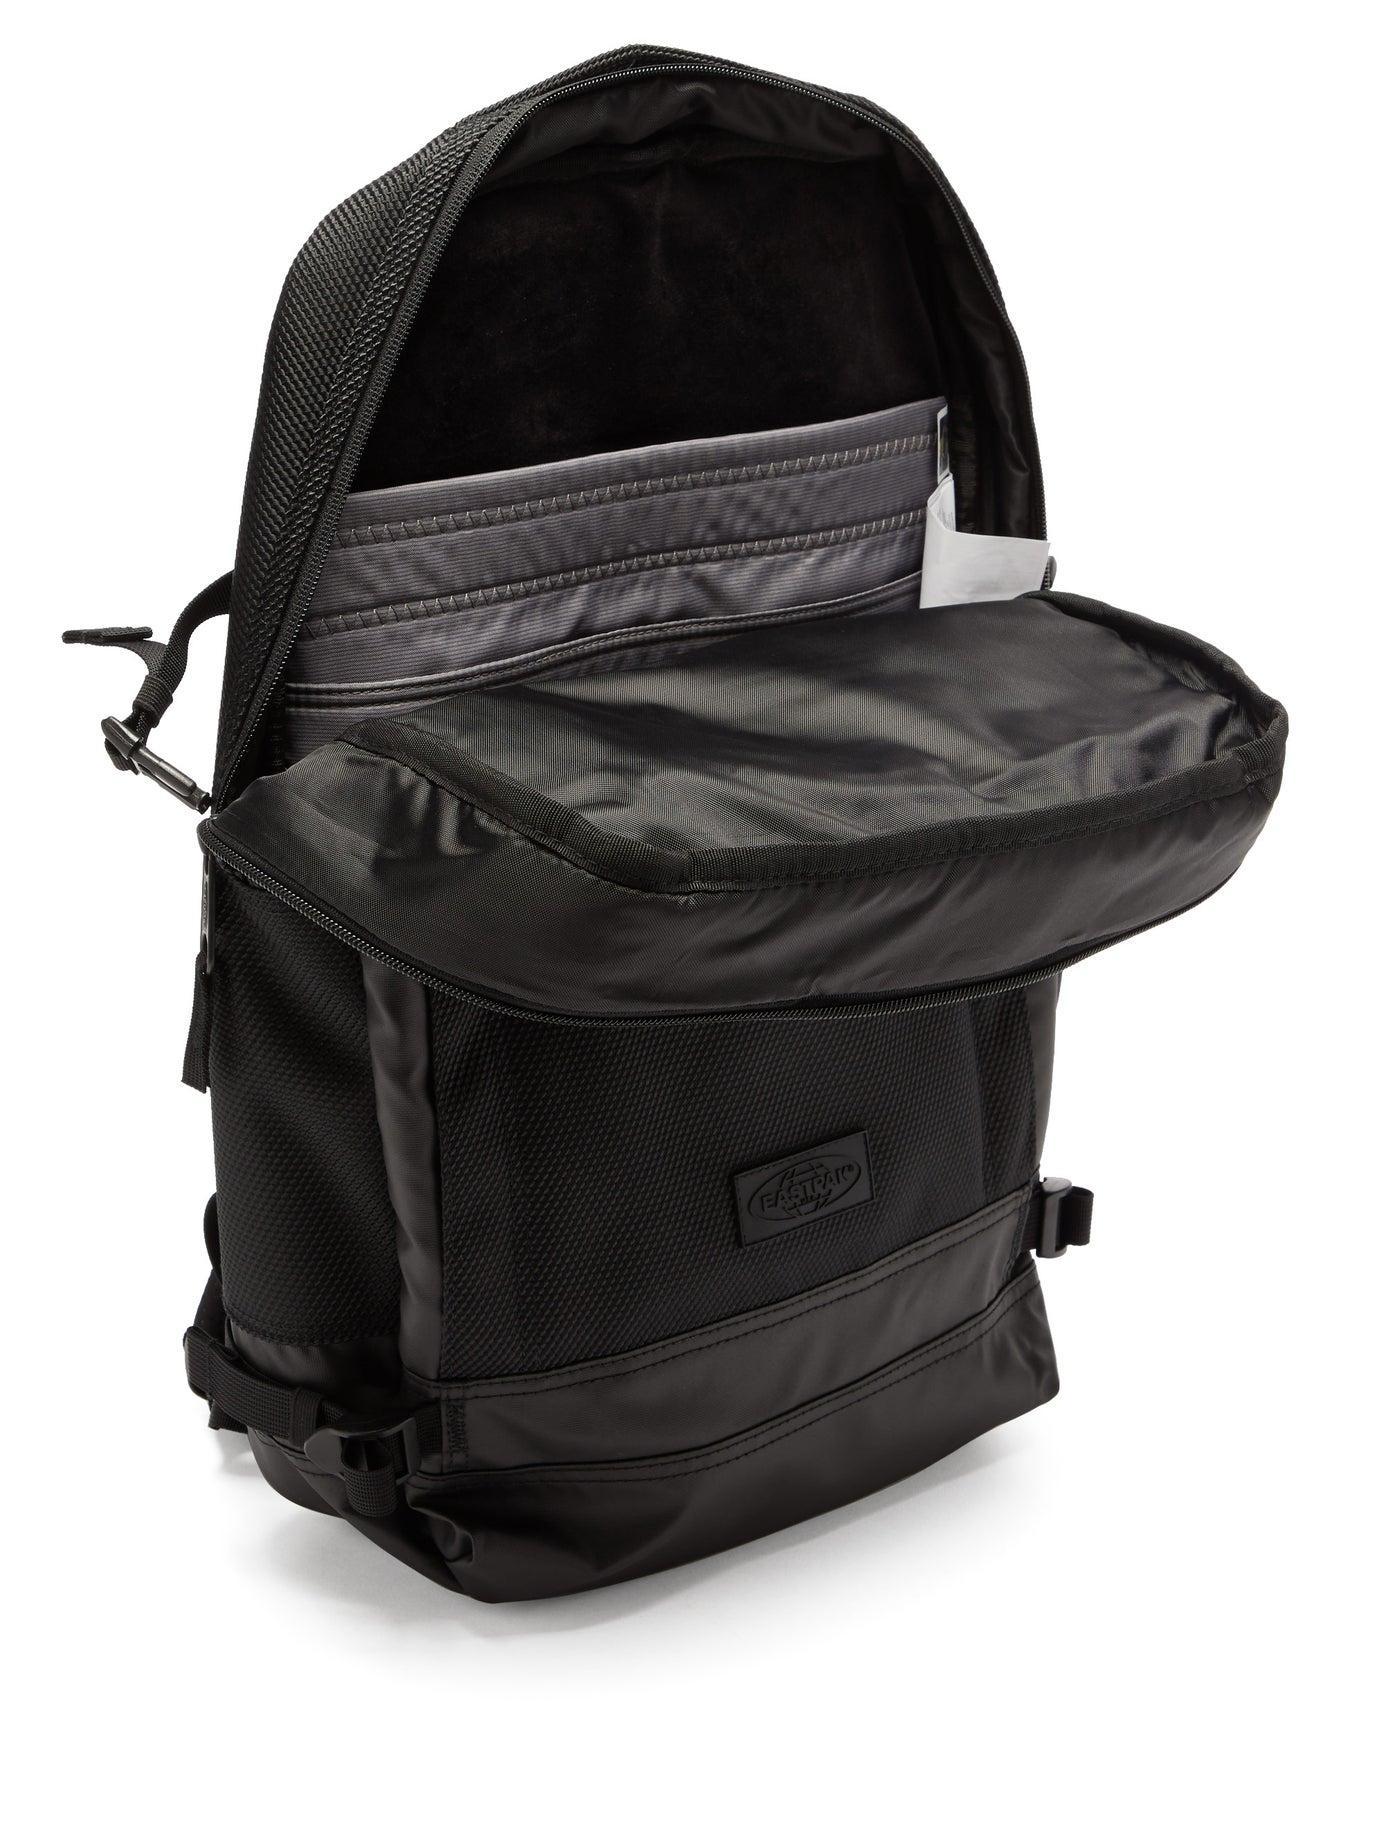 5decc474ee1 Eastpak - Black Tecum M Backpack for Men - Lyst. View fullscreen